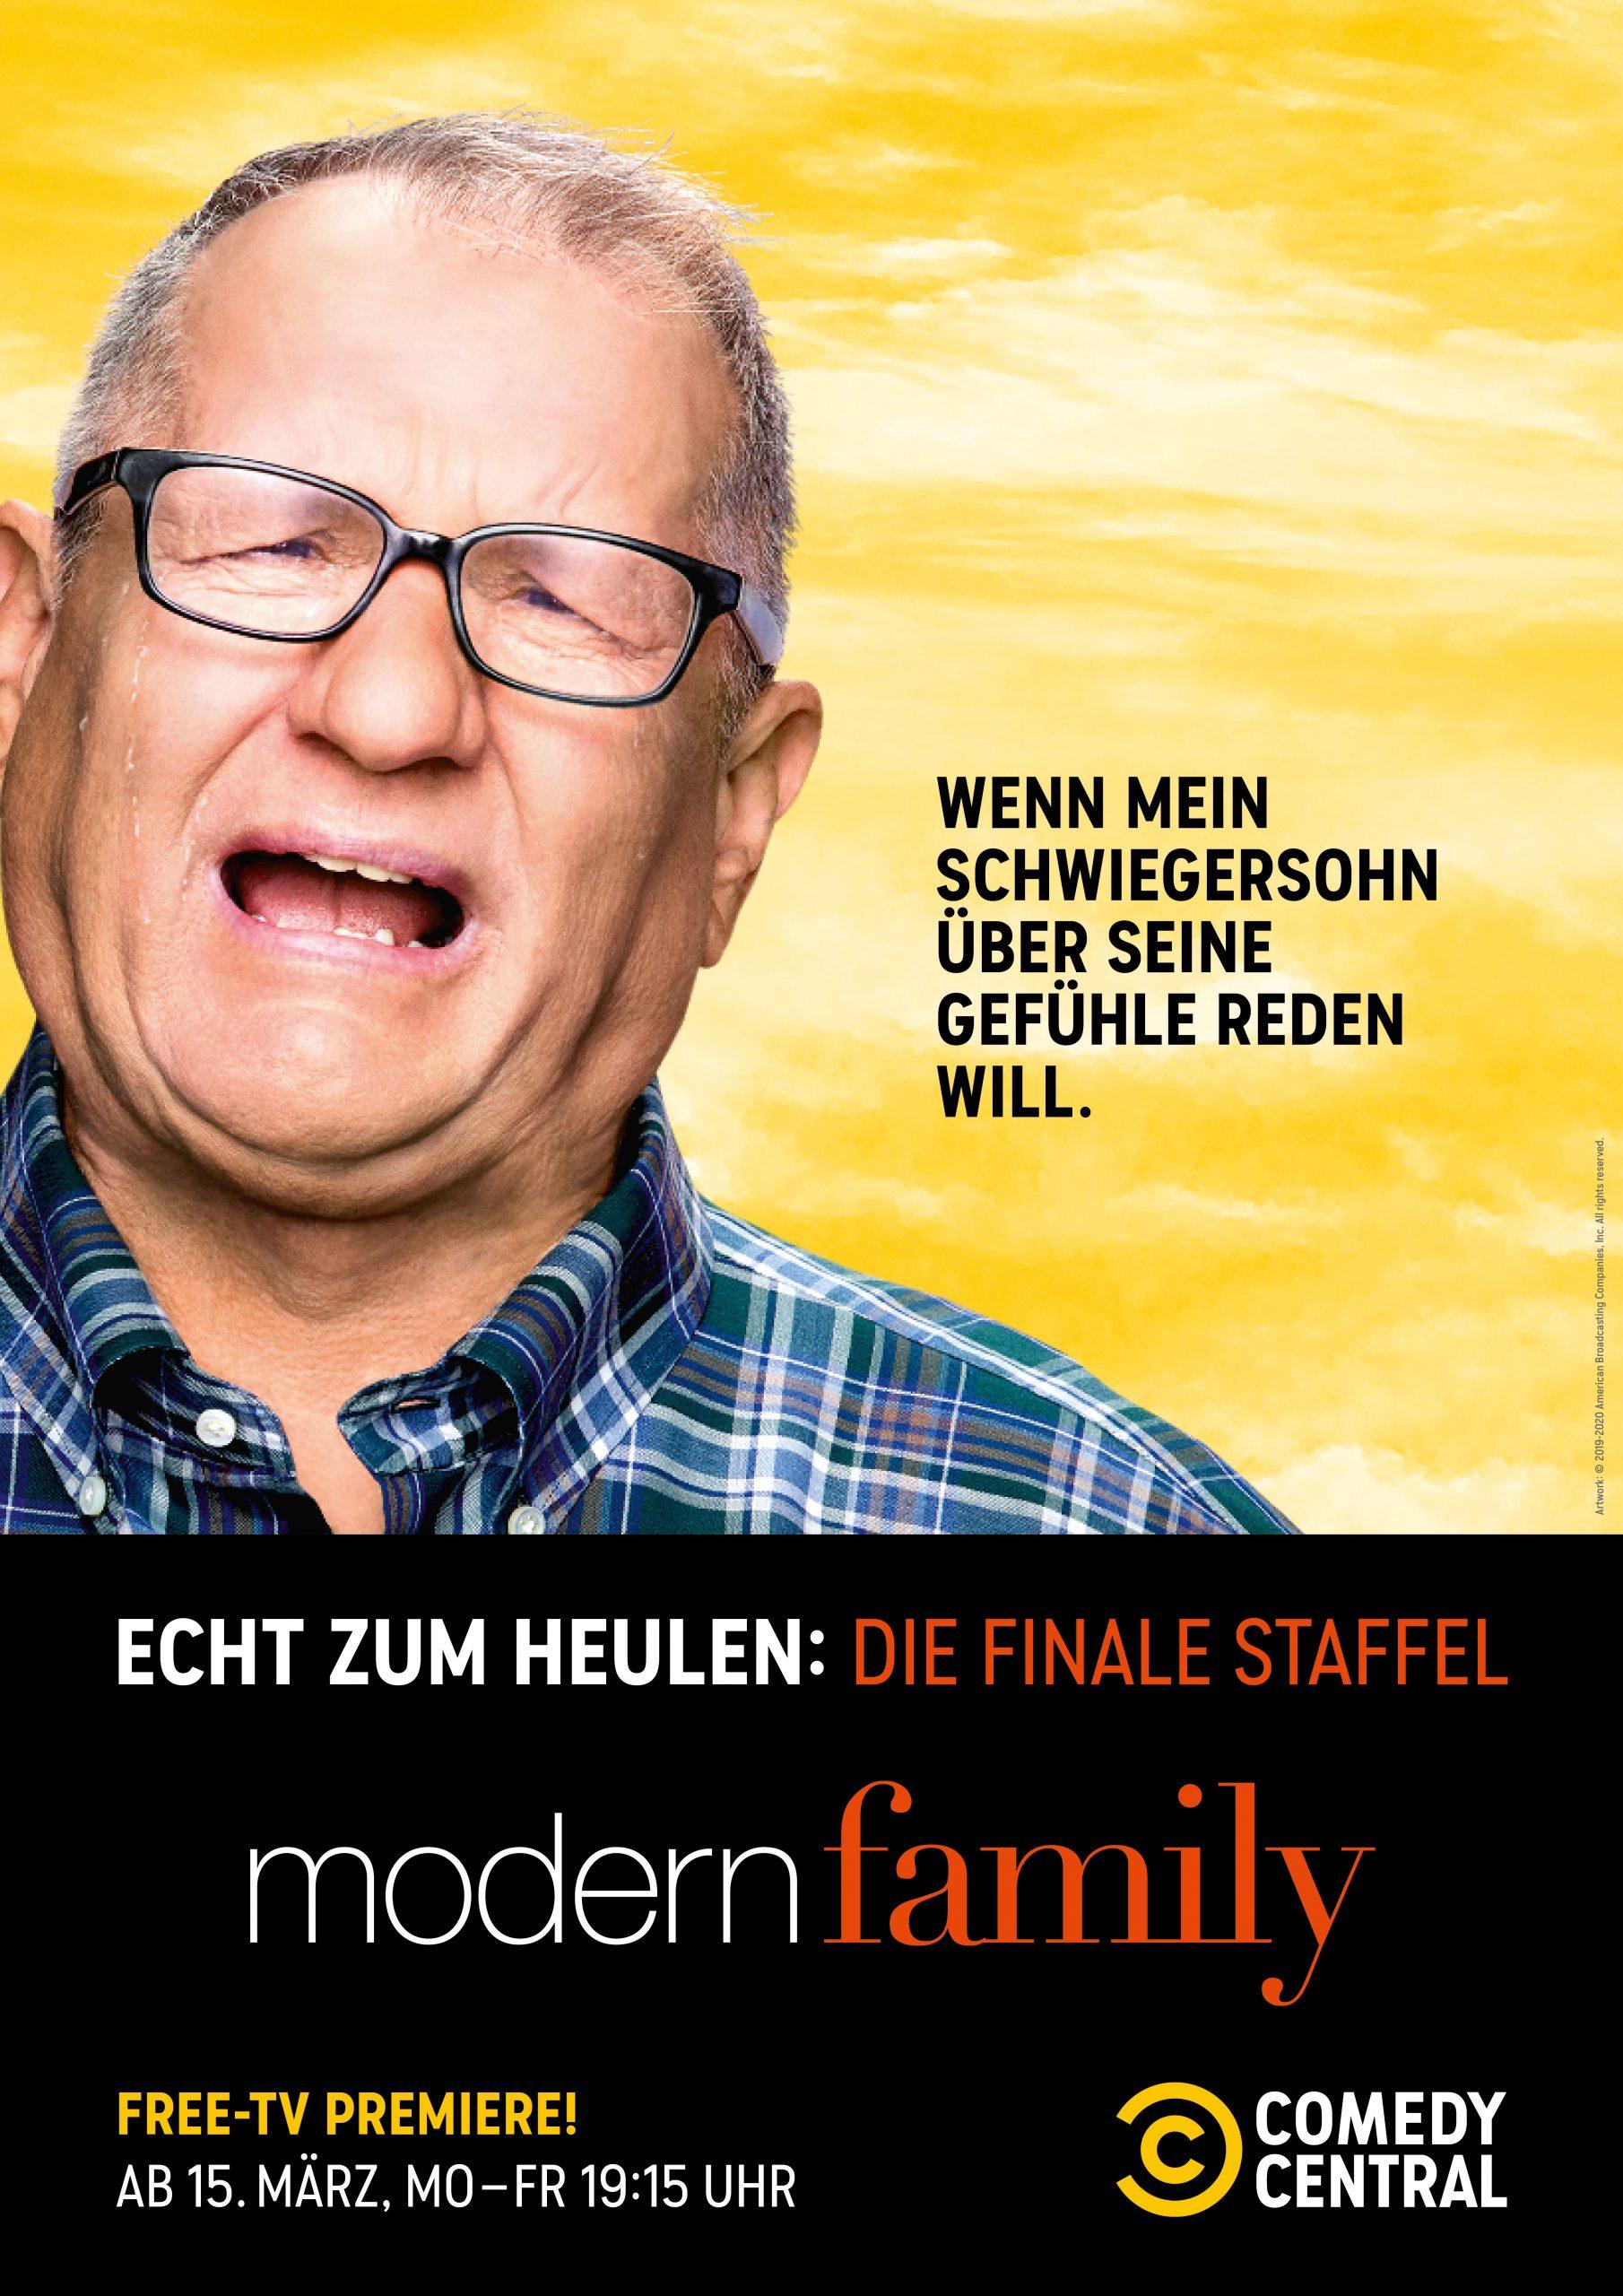 210210_CC_Modern_Family_MasterLayouts_Hochformat5